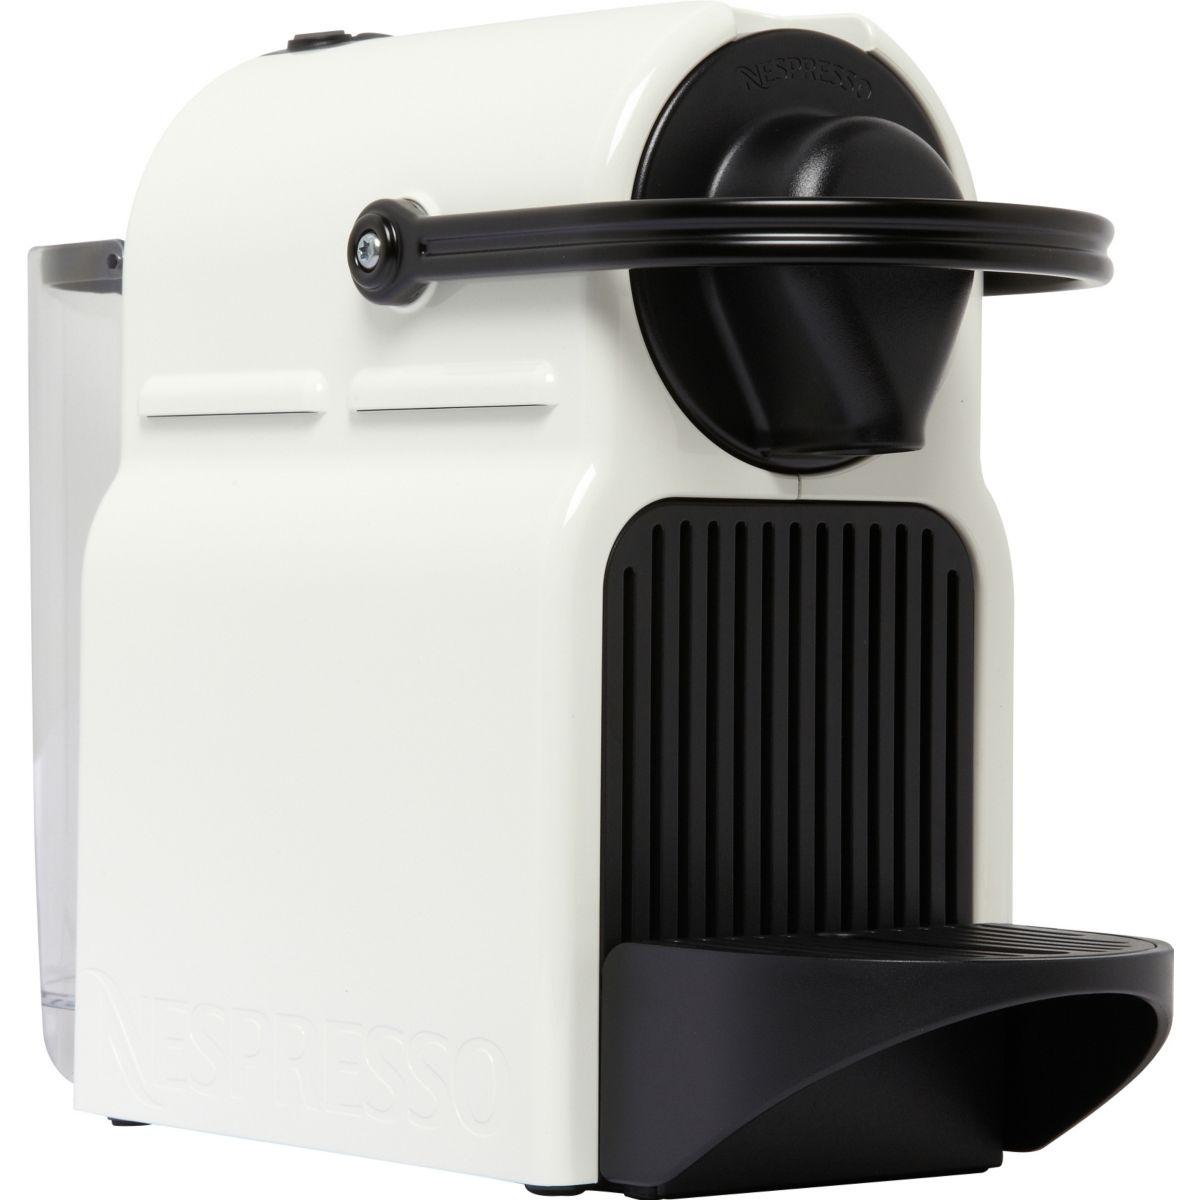 Nespresso KRUPS Inissia Pure White YY1530FD